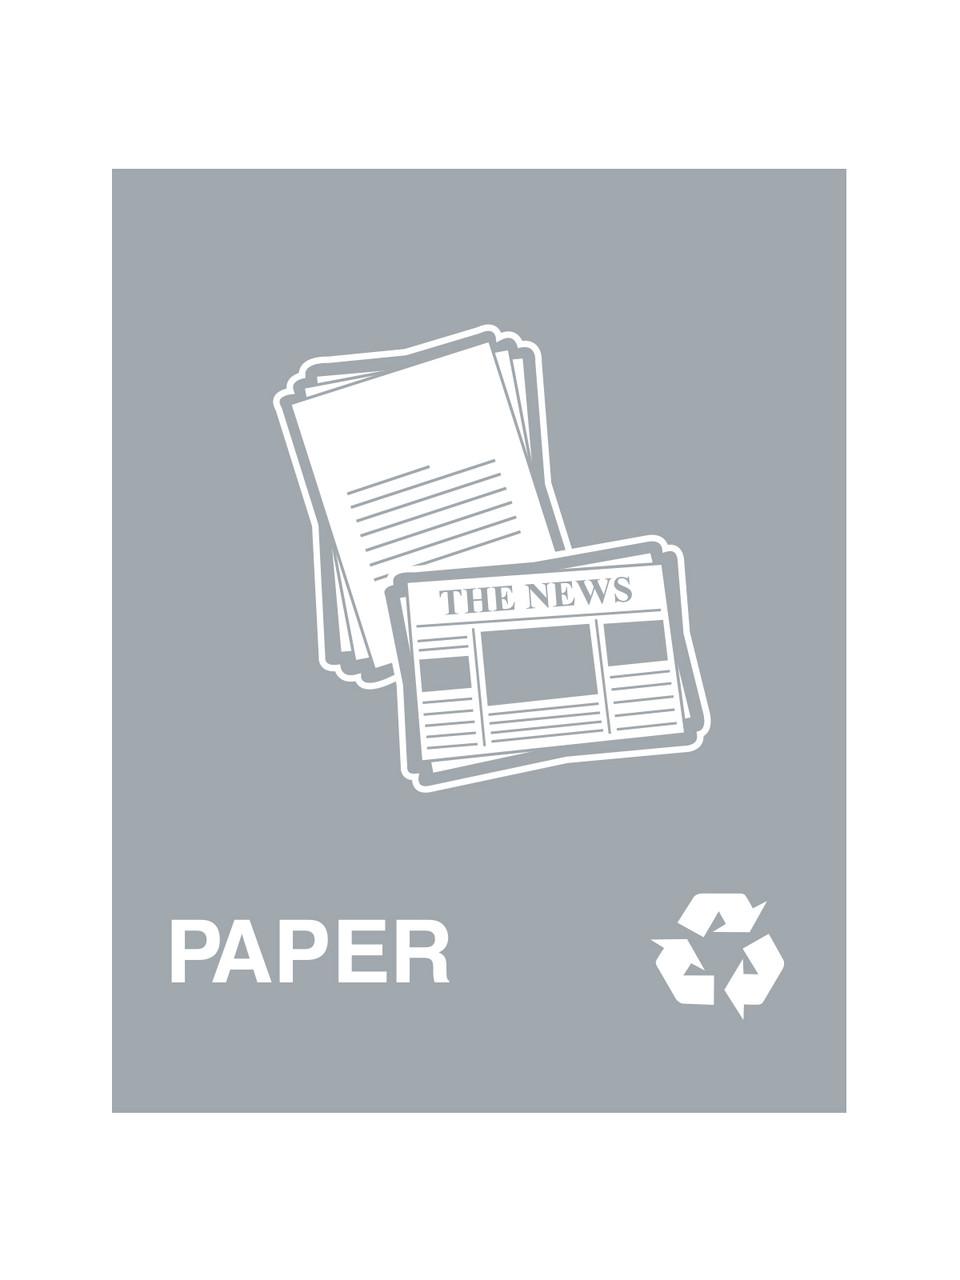 PAPER (GRAY)